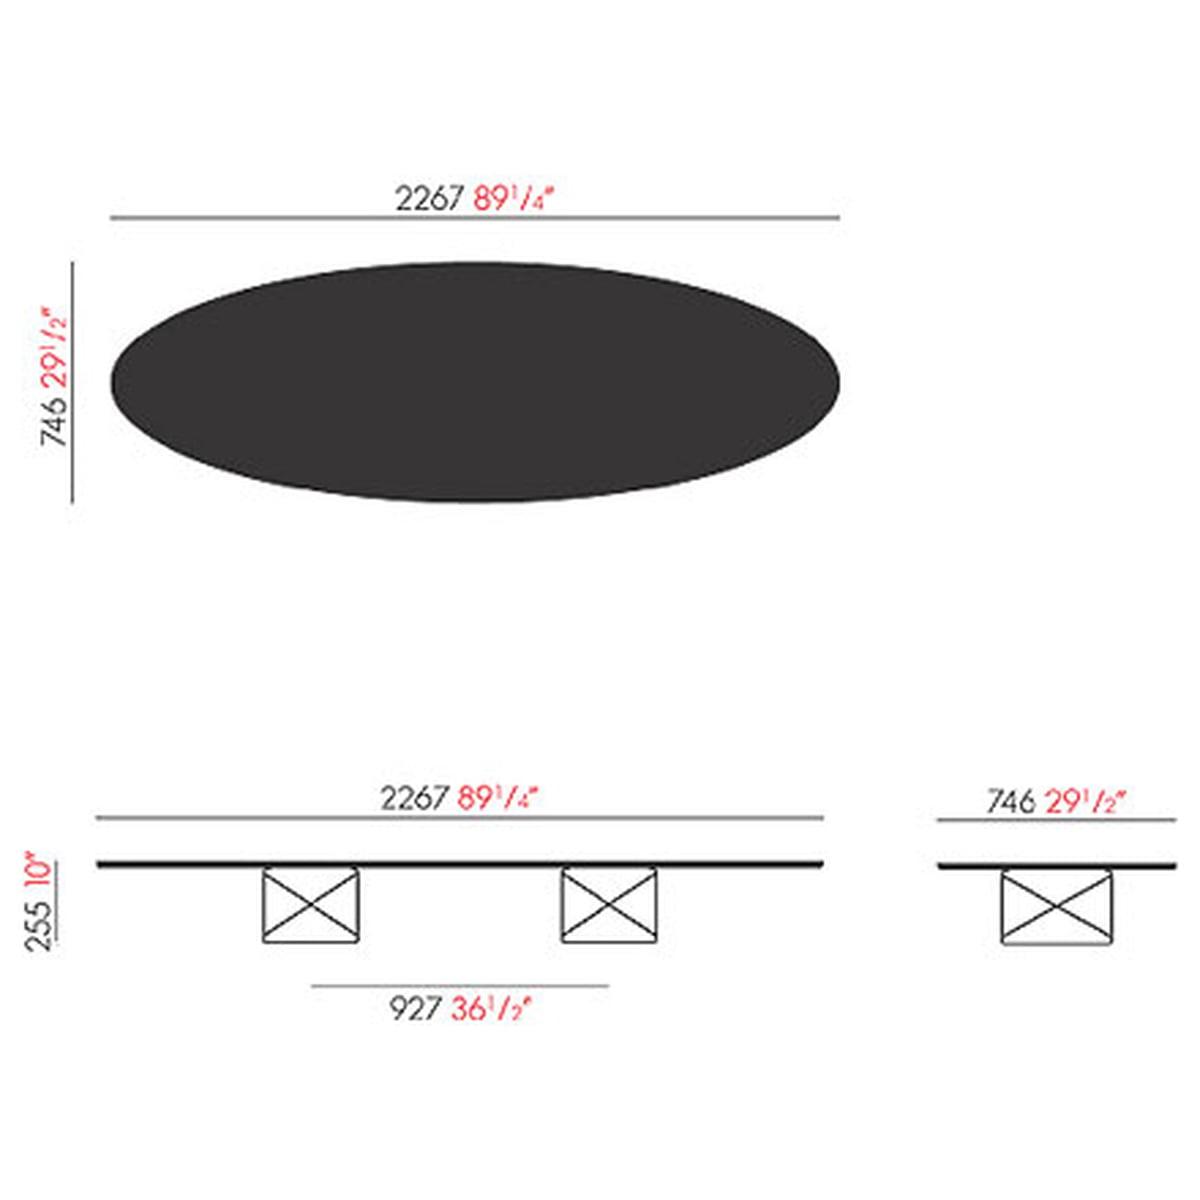 tableau elliptique etr vitra boutique. Black Bedroom Furniture Sets. Home Design Ideas